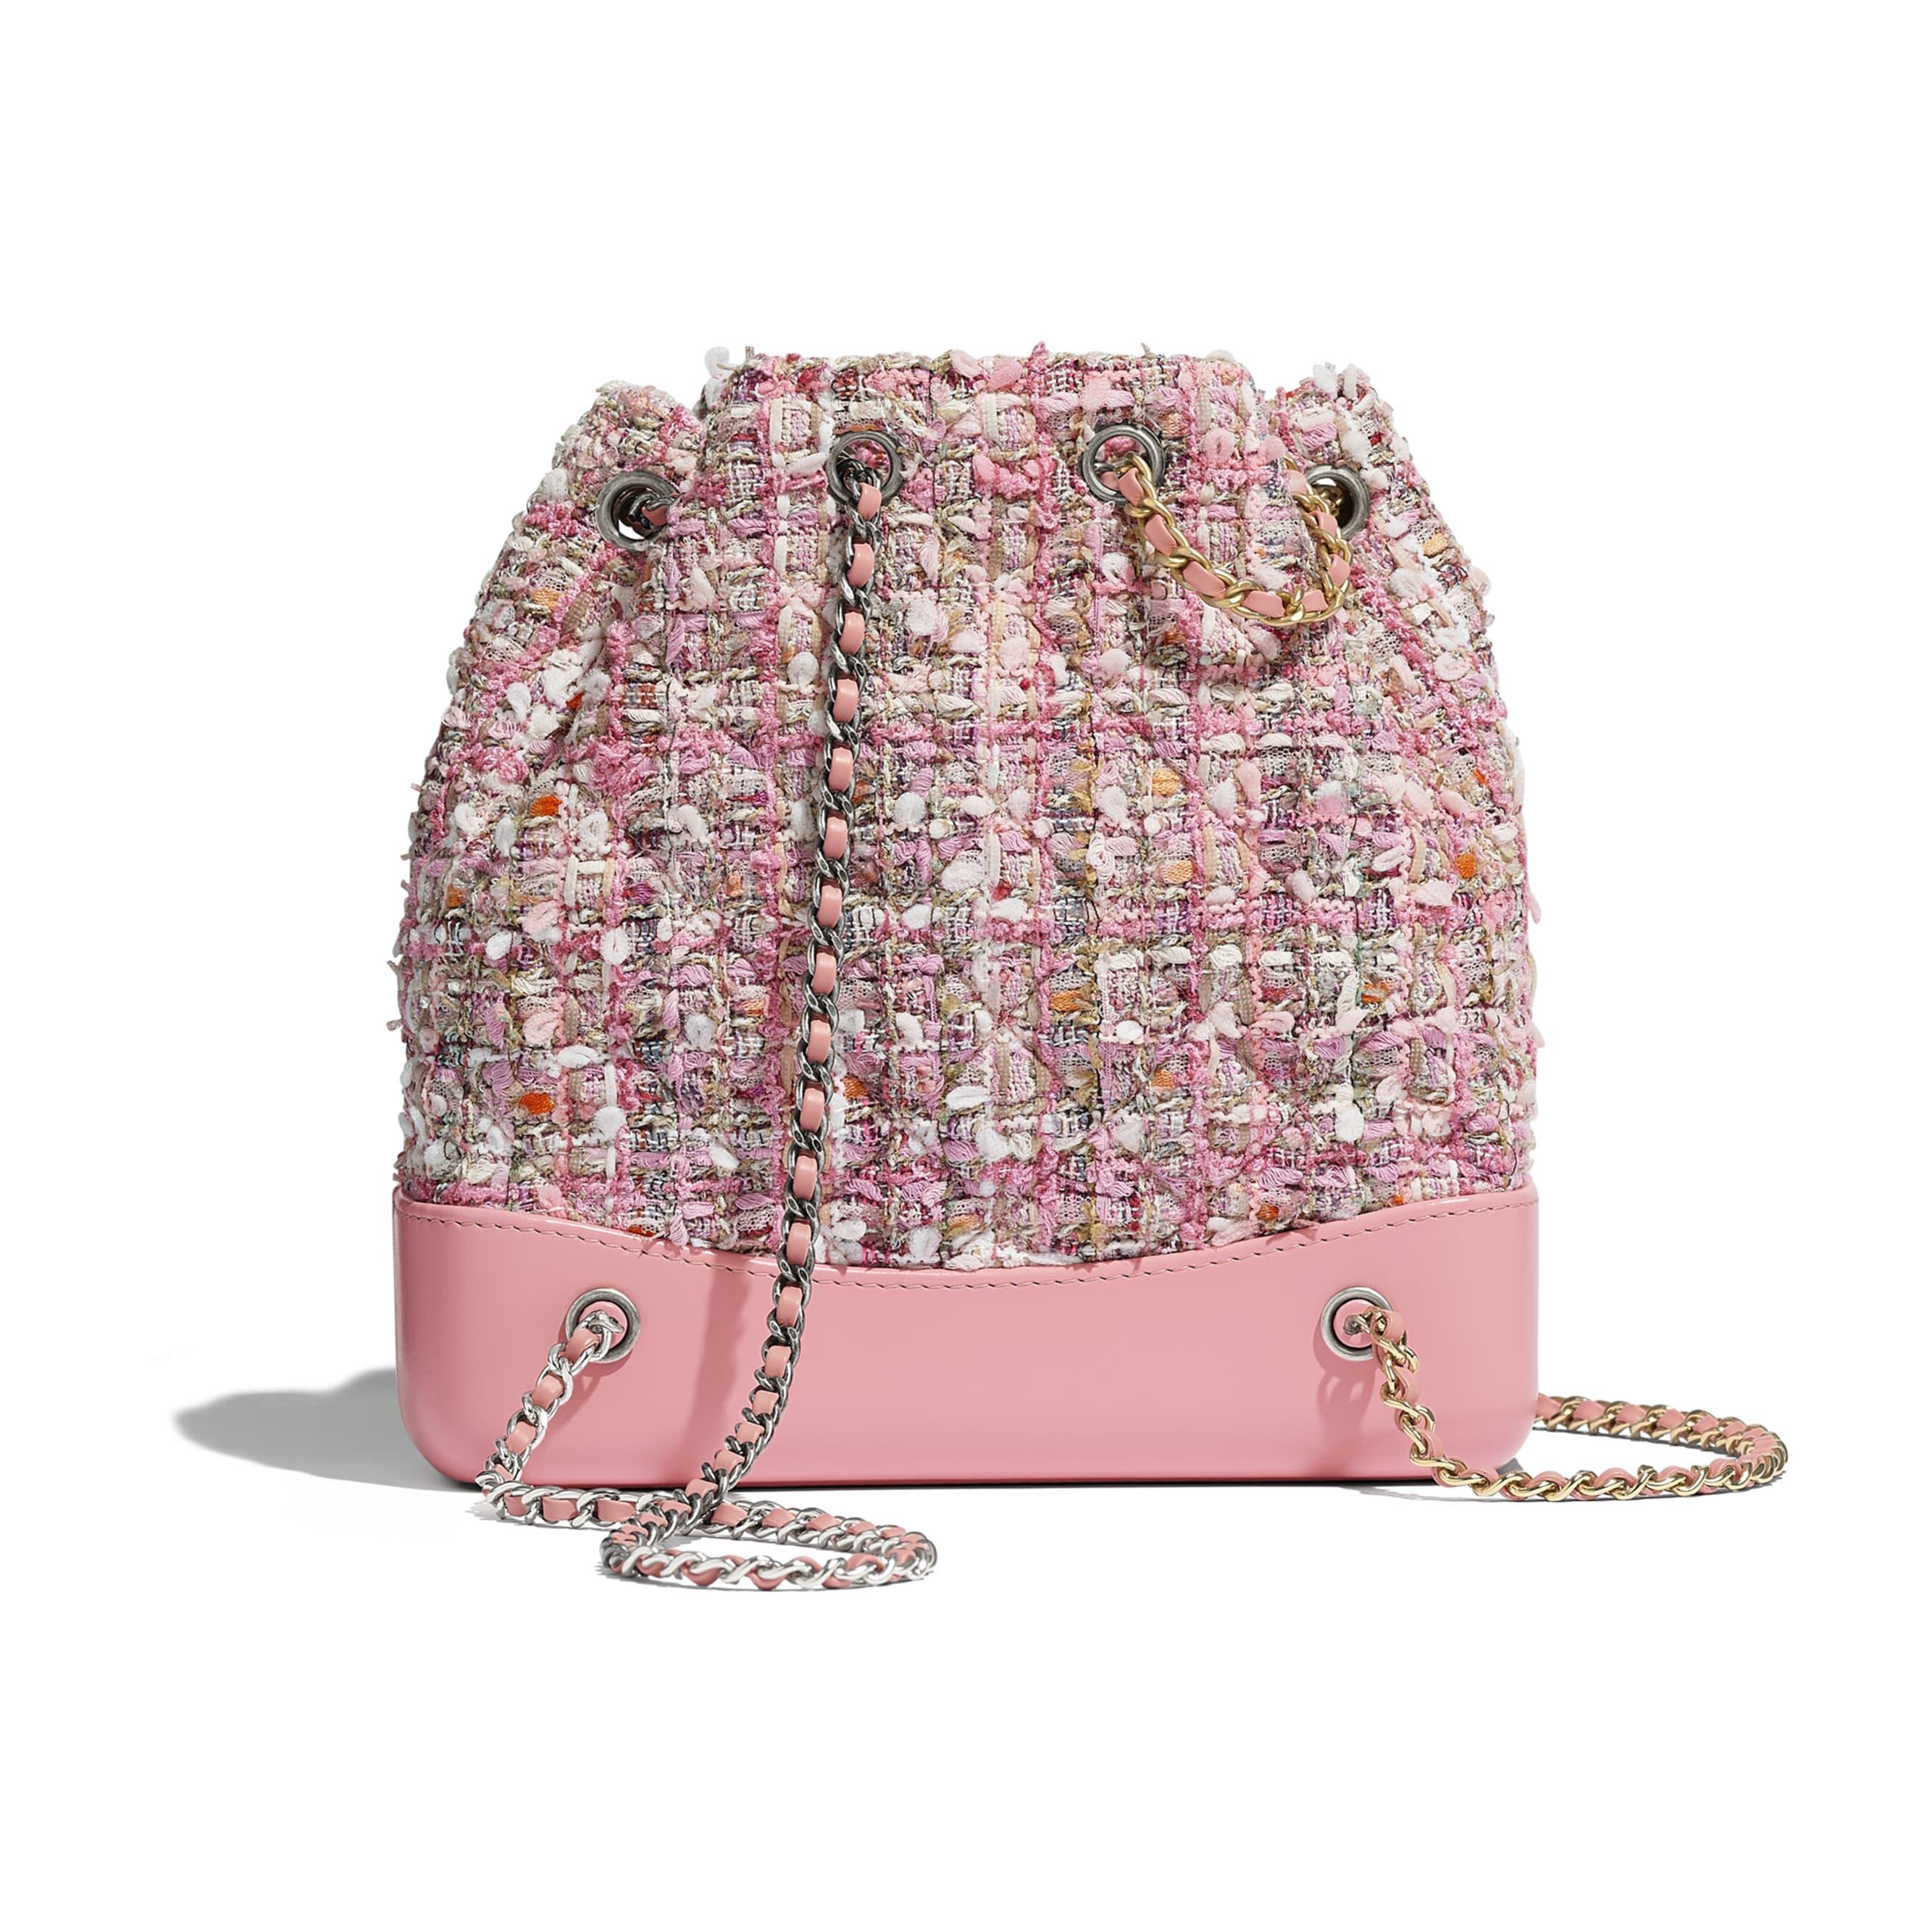 CHANEL'S GABRIELLE Small Backpack - Pink, Beige, Orange & Ecru - Tweed, Shiny Calfskin & Gold-Tone & Silver-Tone Metal - Alternative view - see standard sized version